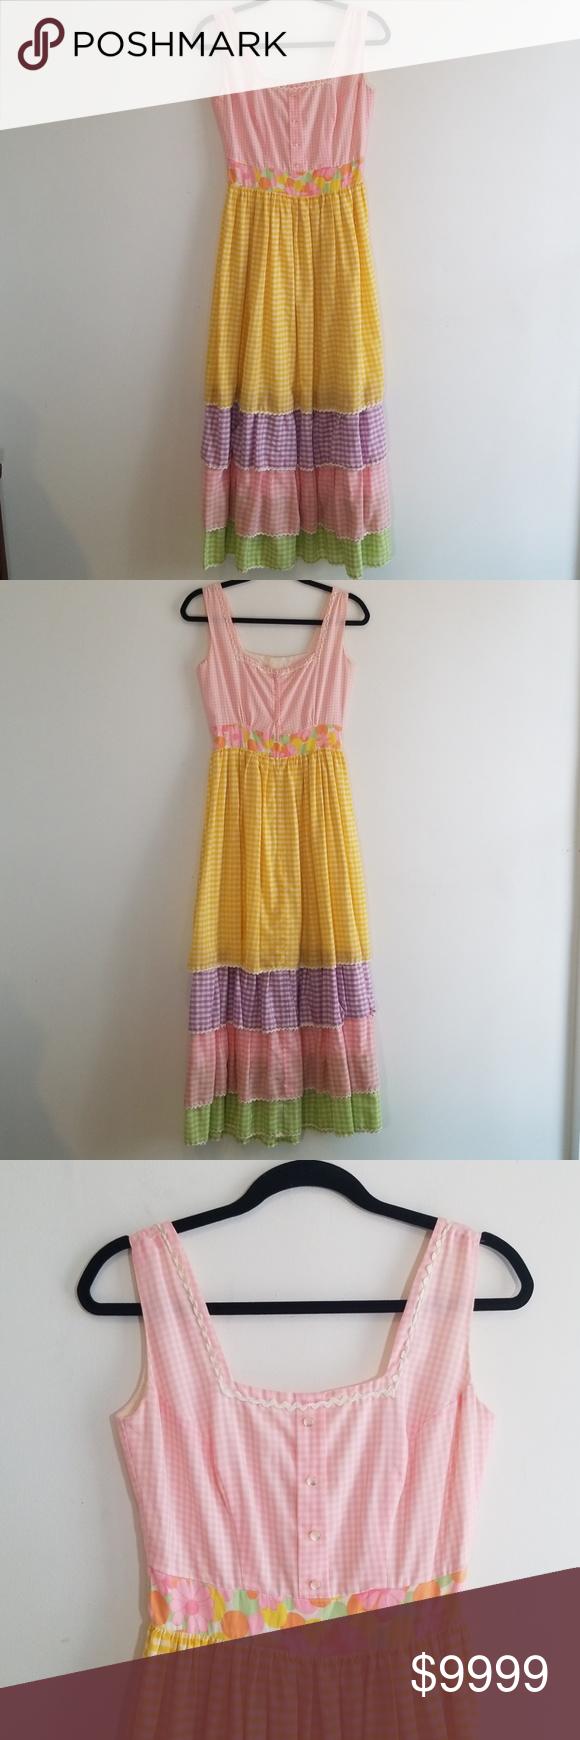 S vintage colorful gingham maxi dress